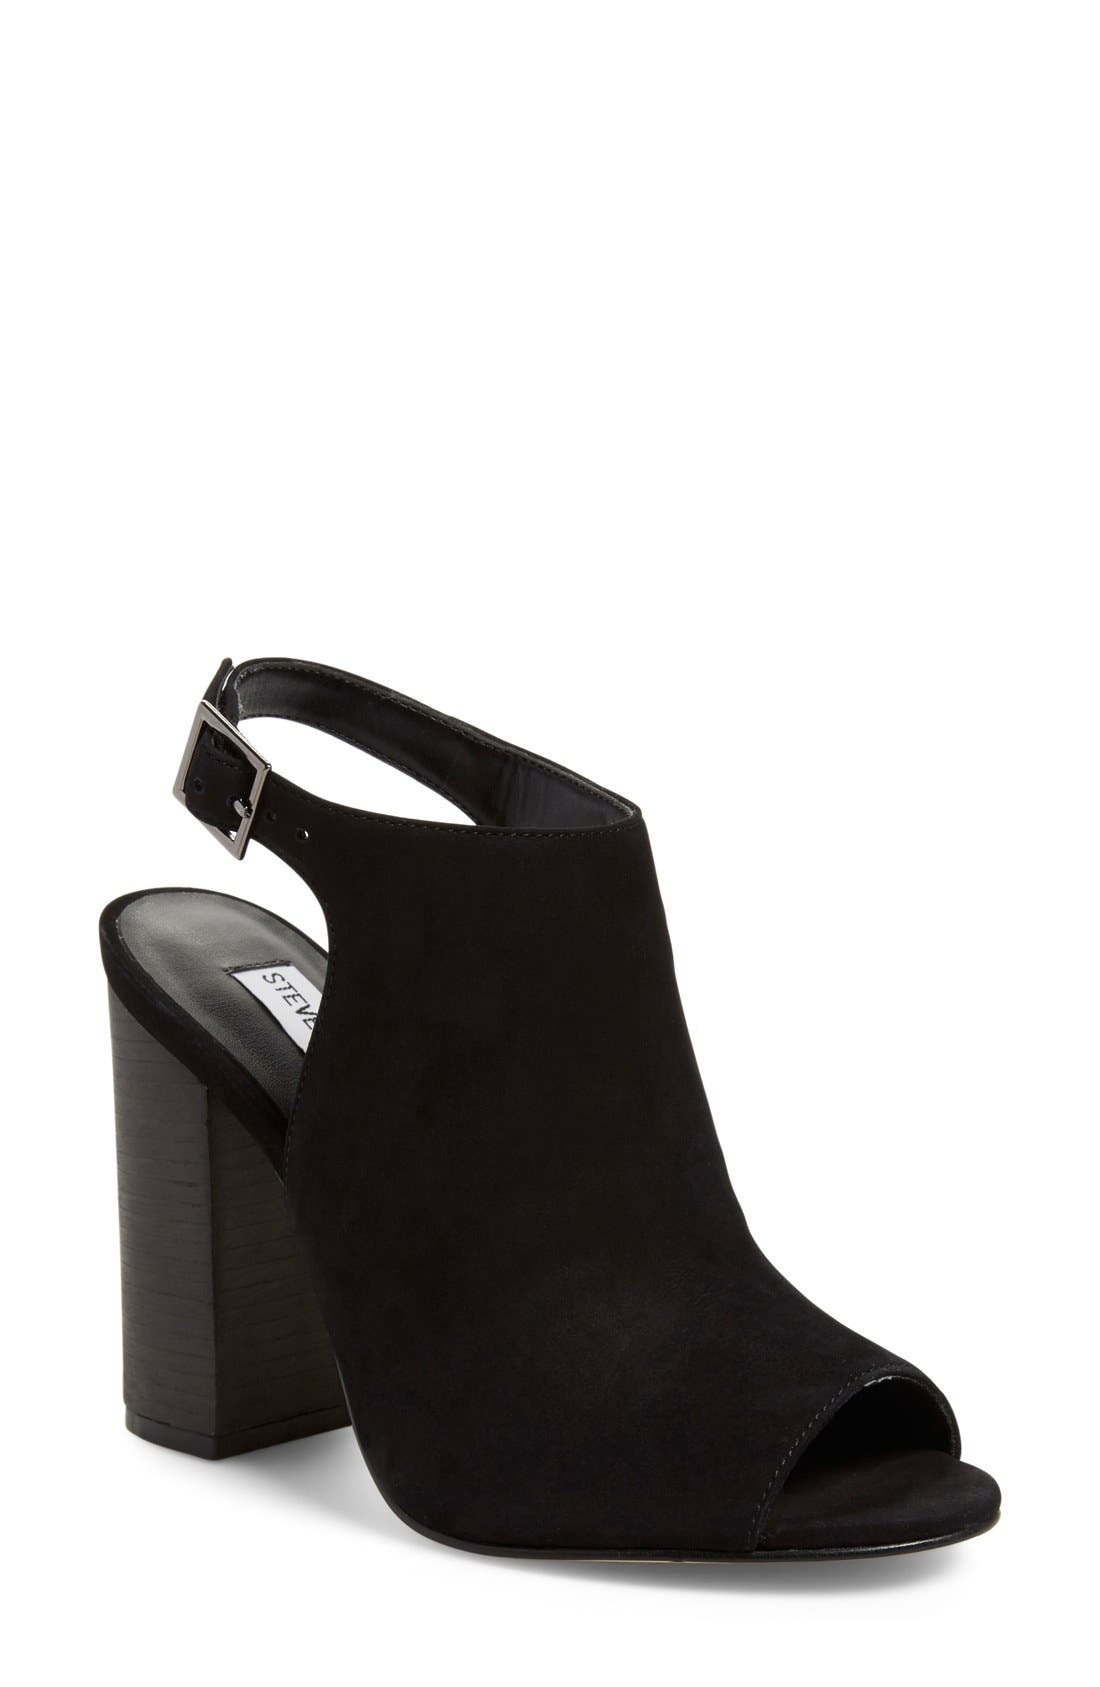 'Claara' Block Heel Sandal,                             Main thumbnail 1, color,